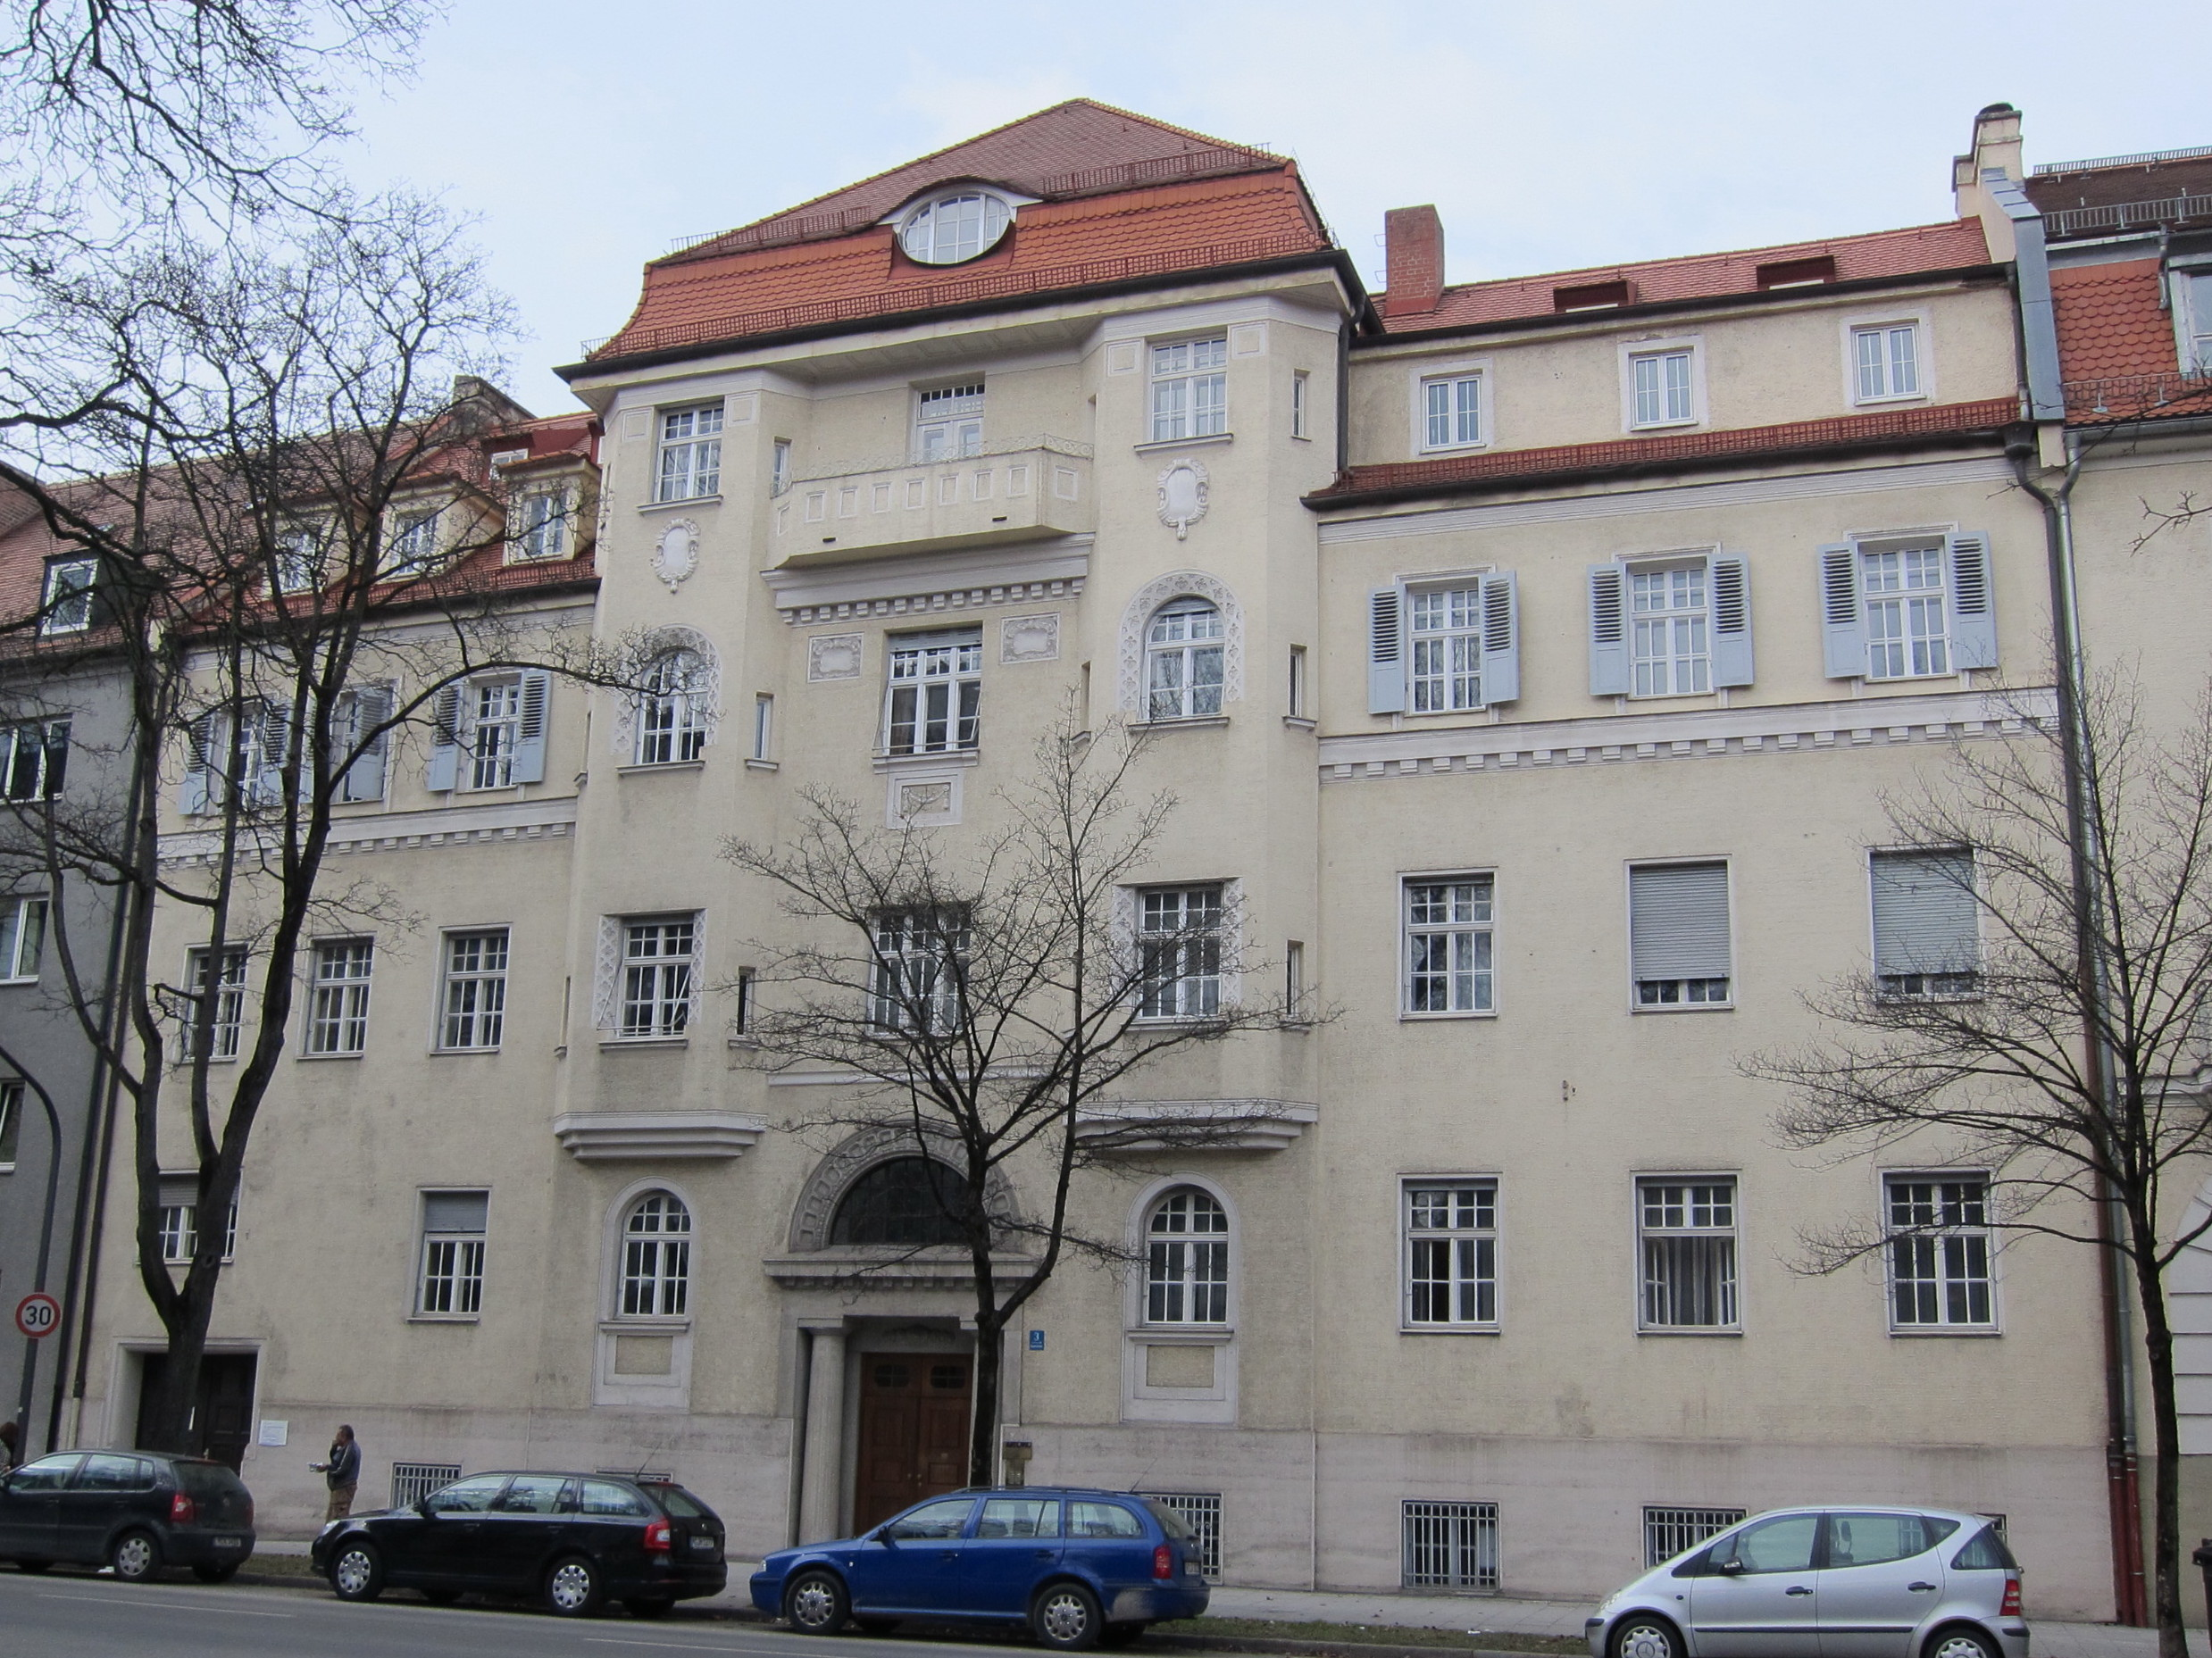 Mauerkircherstr München file mauerkircherstr 3 muenchen 01 jpg wikimedia commons